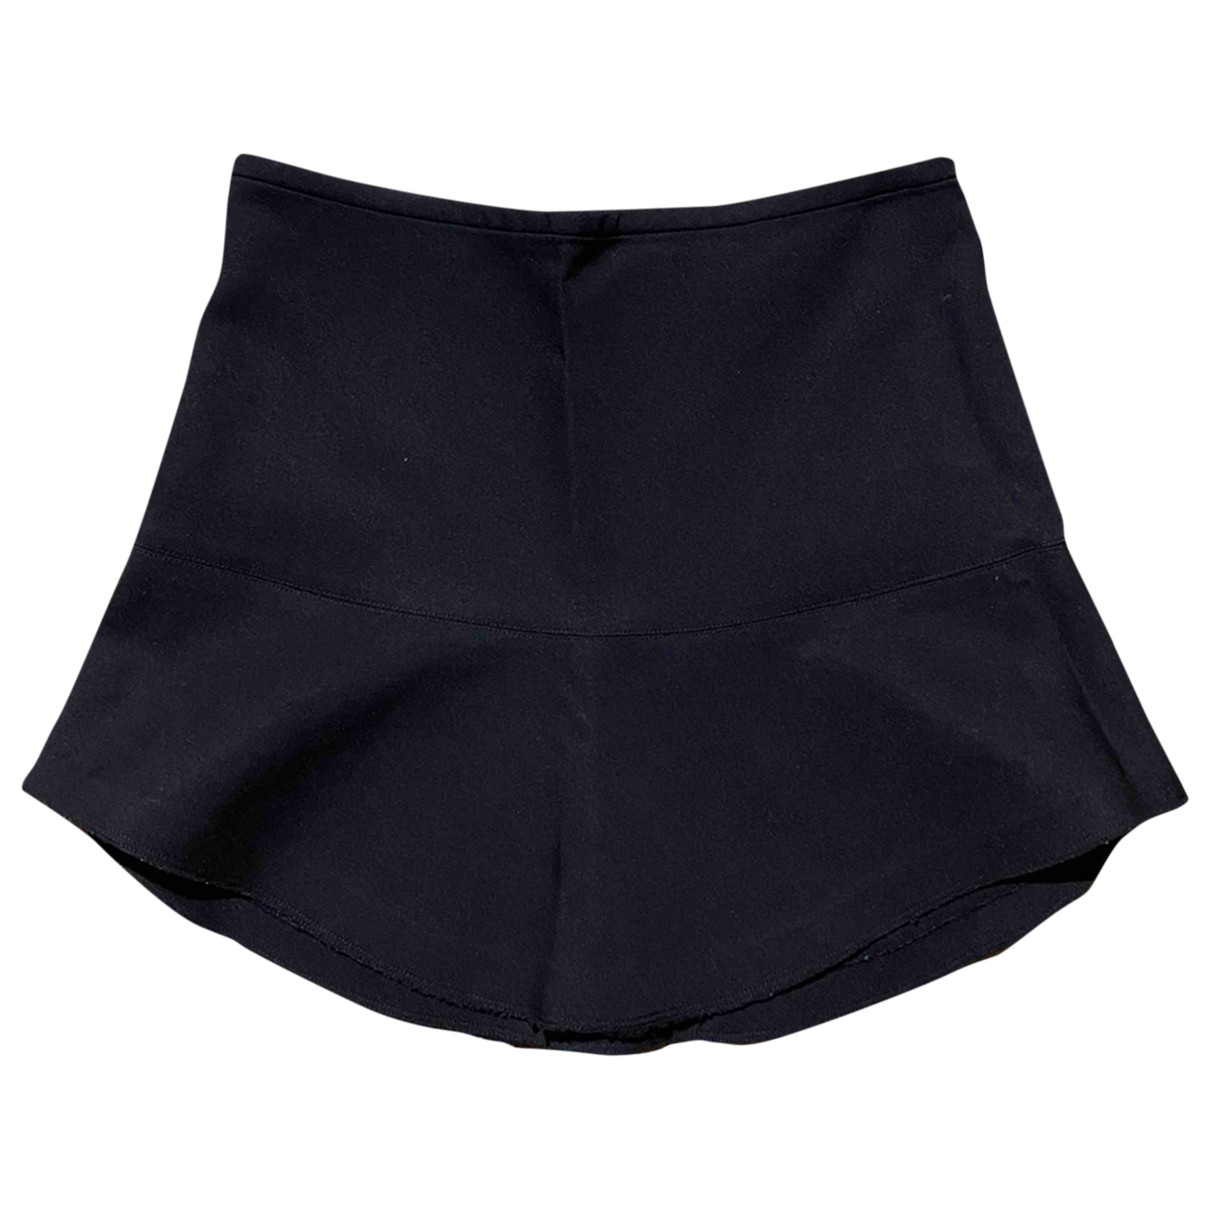 Iro - Jupe Spring Summer 2020 pour femme en soie - noir